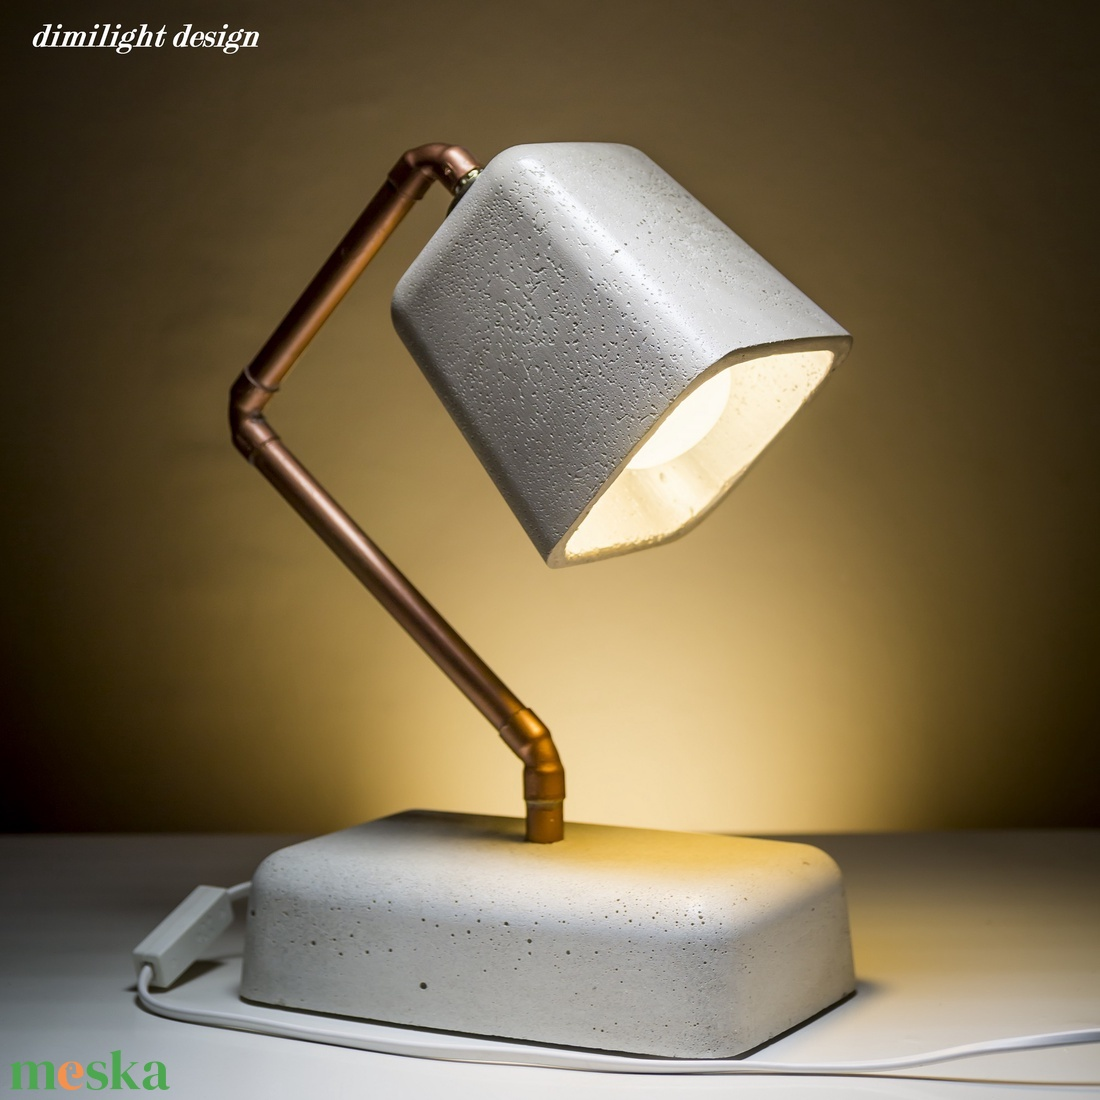 Design beton asztali lámpa UTOLSÓ DARAB ! (dimethm) - Meska.hu